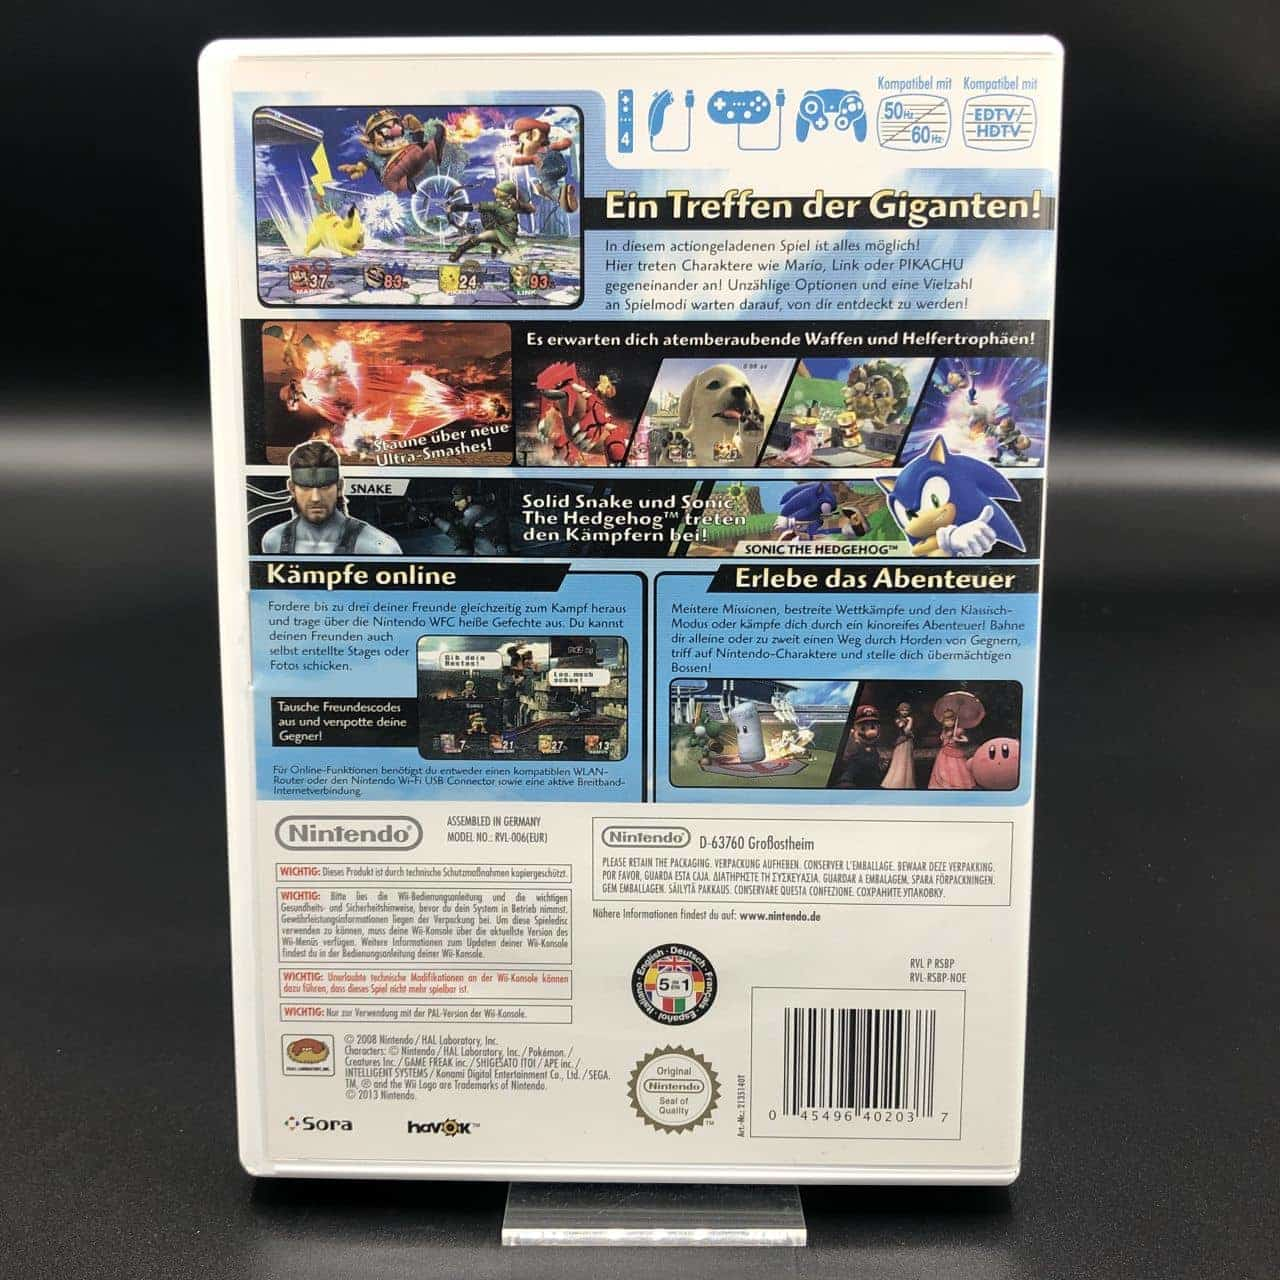 Super Smash Bros. Brawl (Nintendo Selects) (Komplett) (Sehr gut) Nintendo Wii